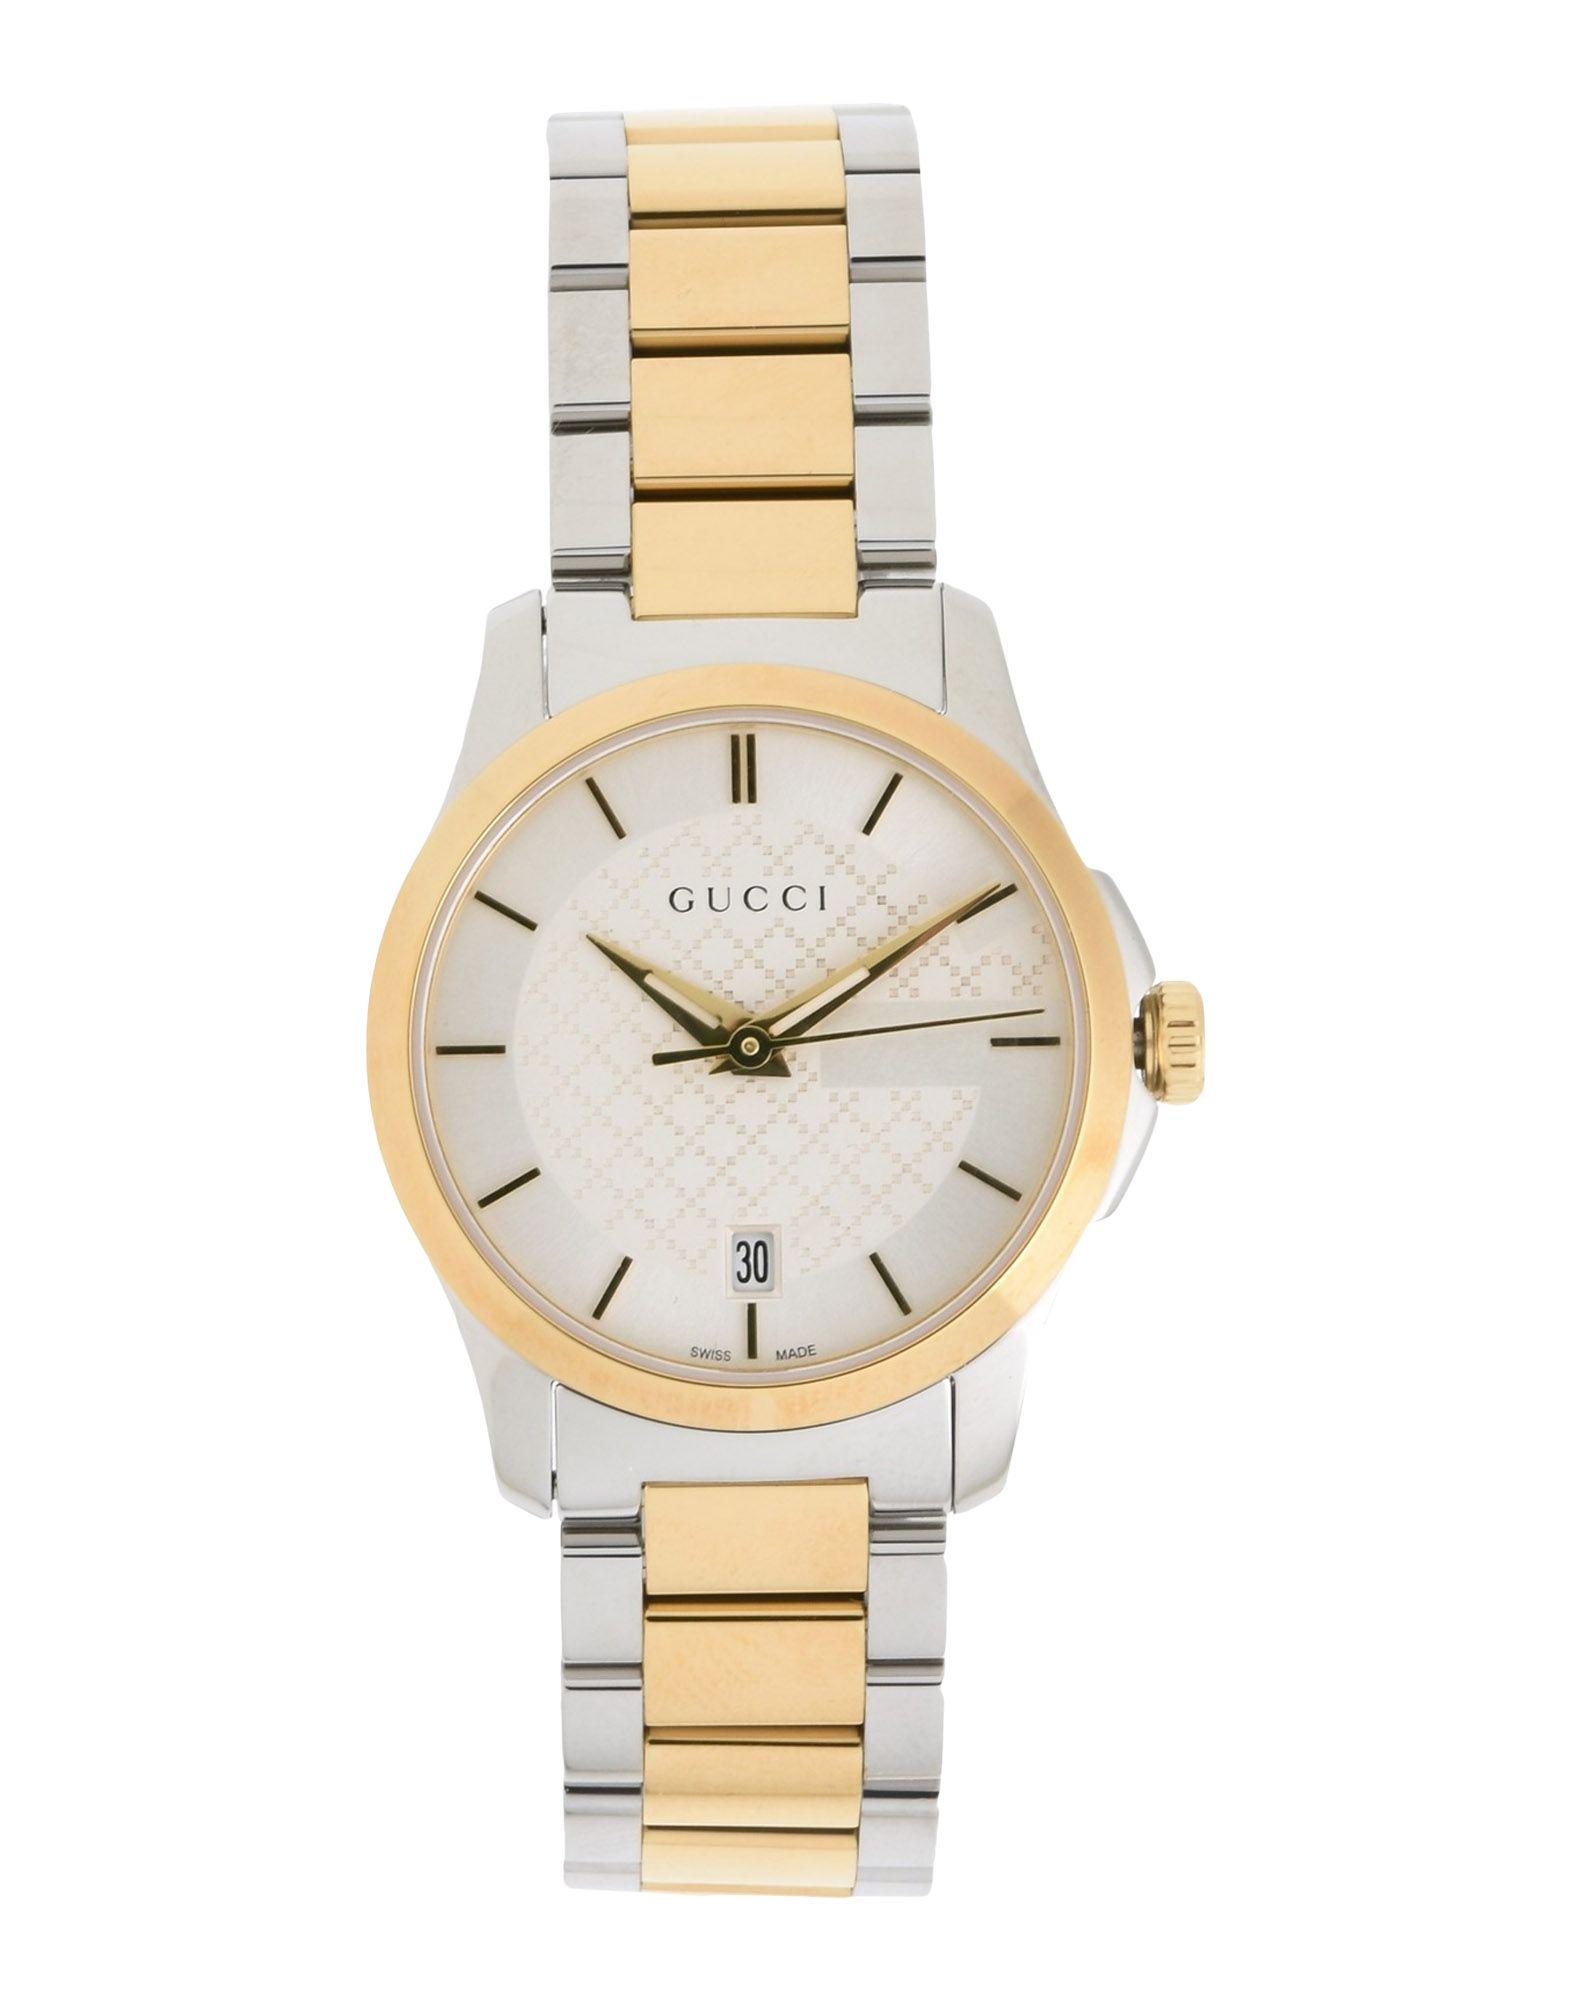 Gucci Wrist Watches Shop At Ebates